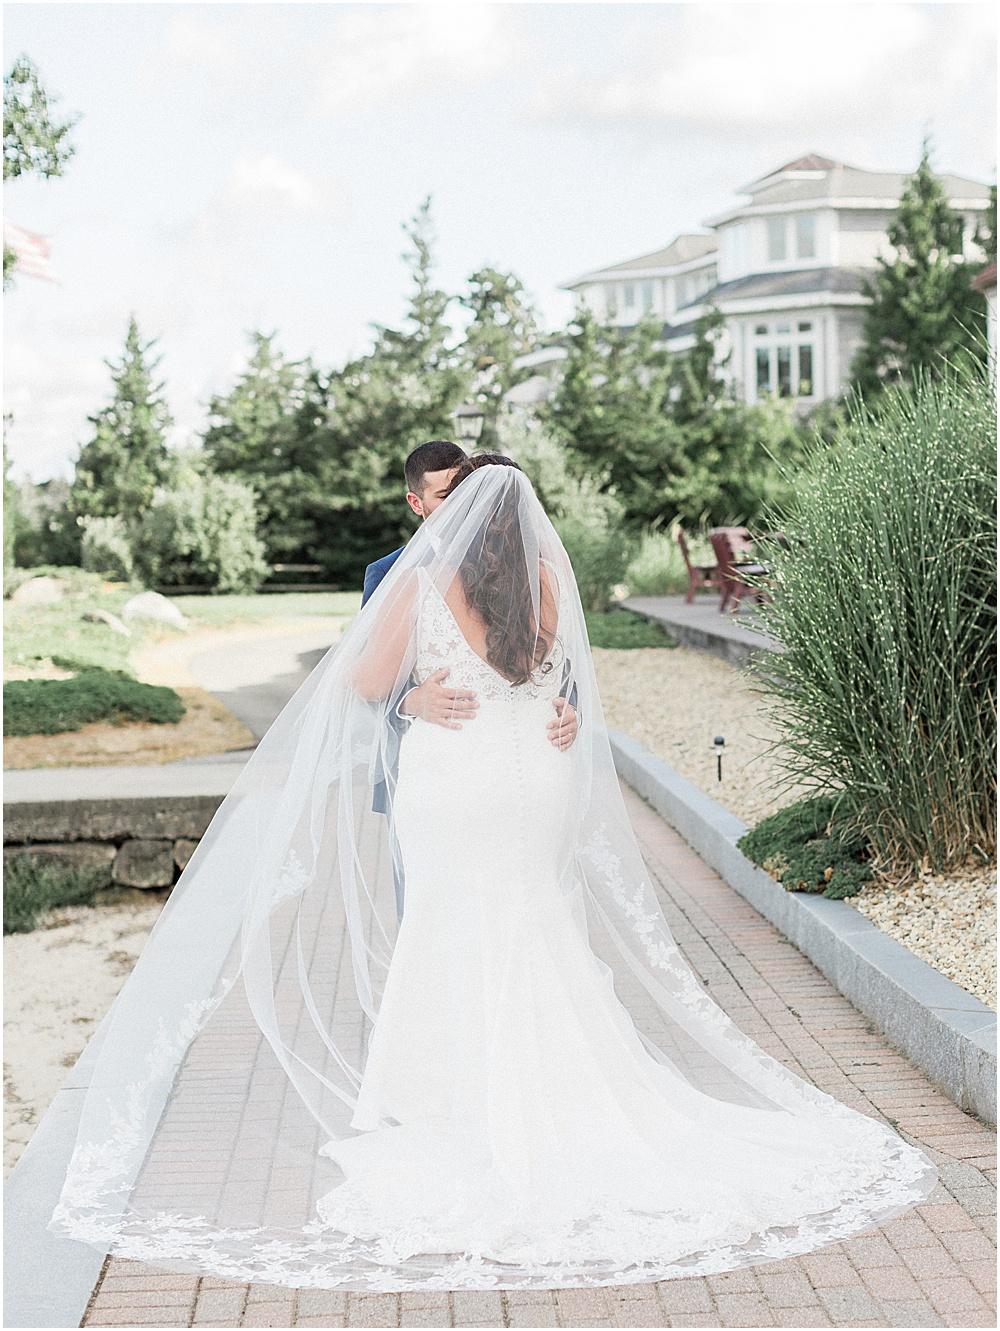 tabor_academy_rebecca_chris_tented_interior_trees_engagement_session_cape_cod_massachusetts_boston_wedding_photographer_meredith_jane_photography_photo_0713.jpg